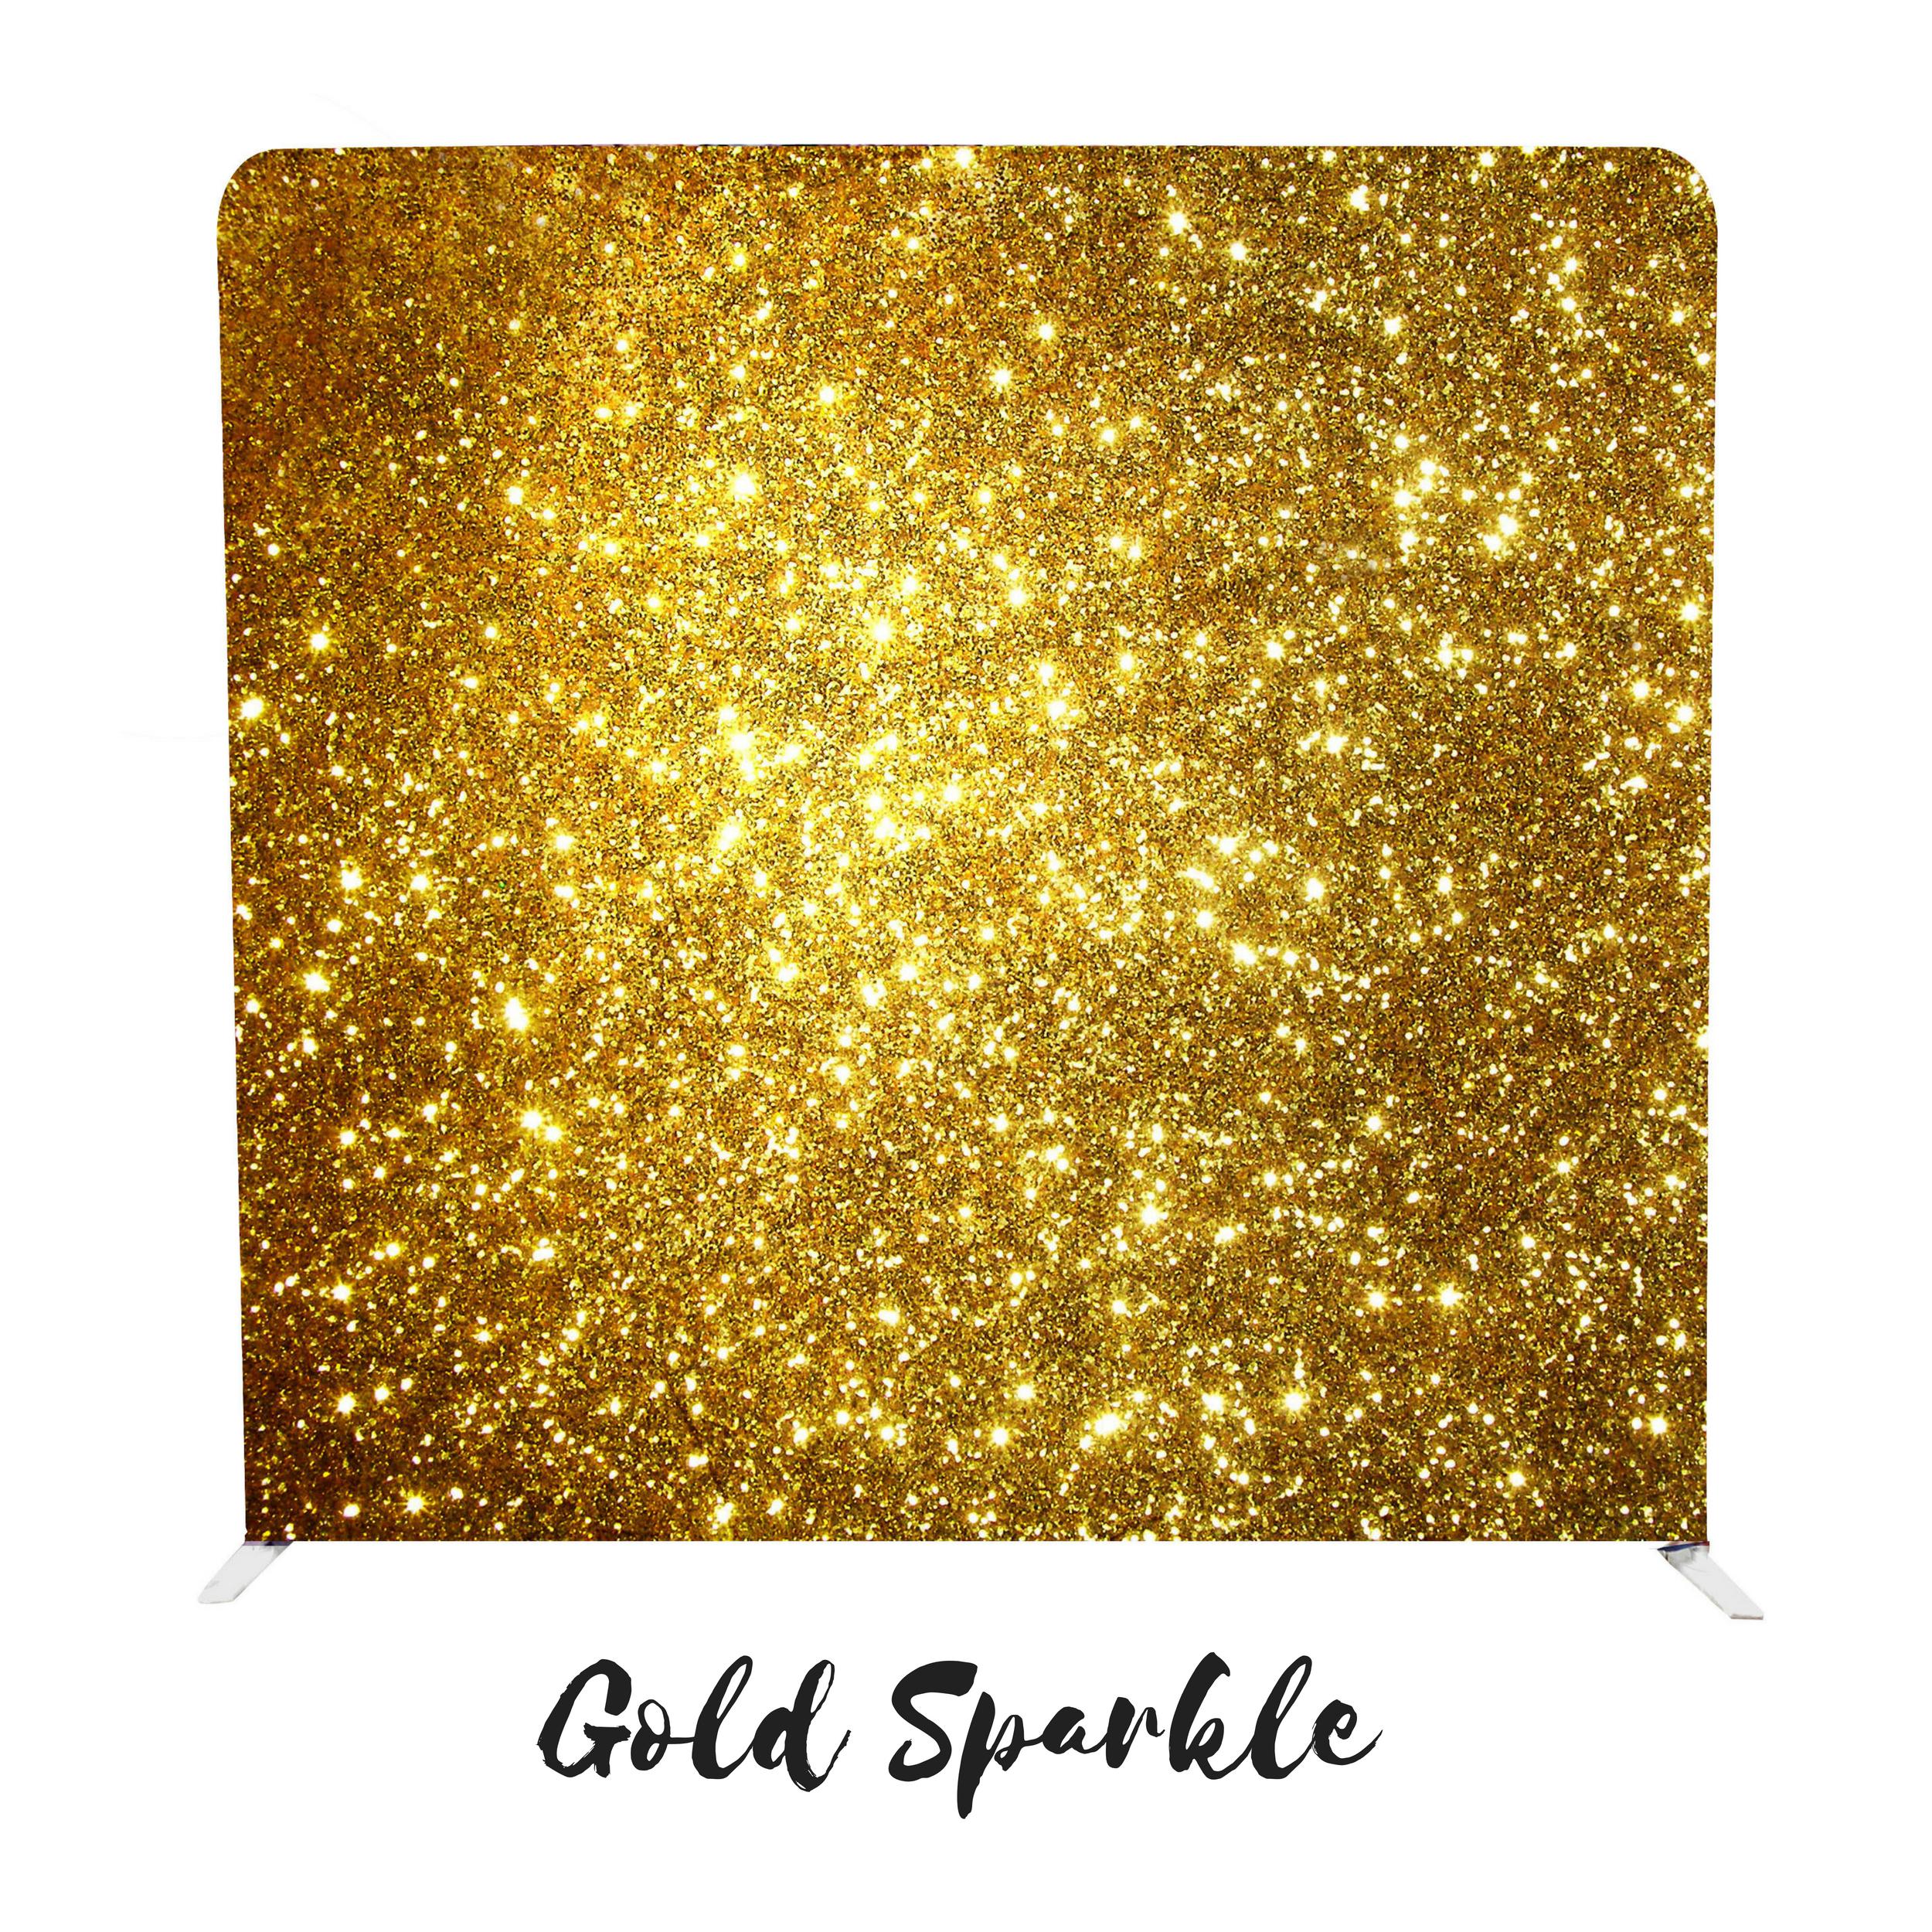 Gold Sparkle.jpg